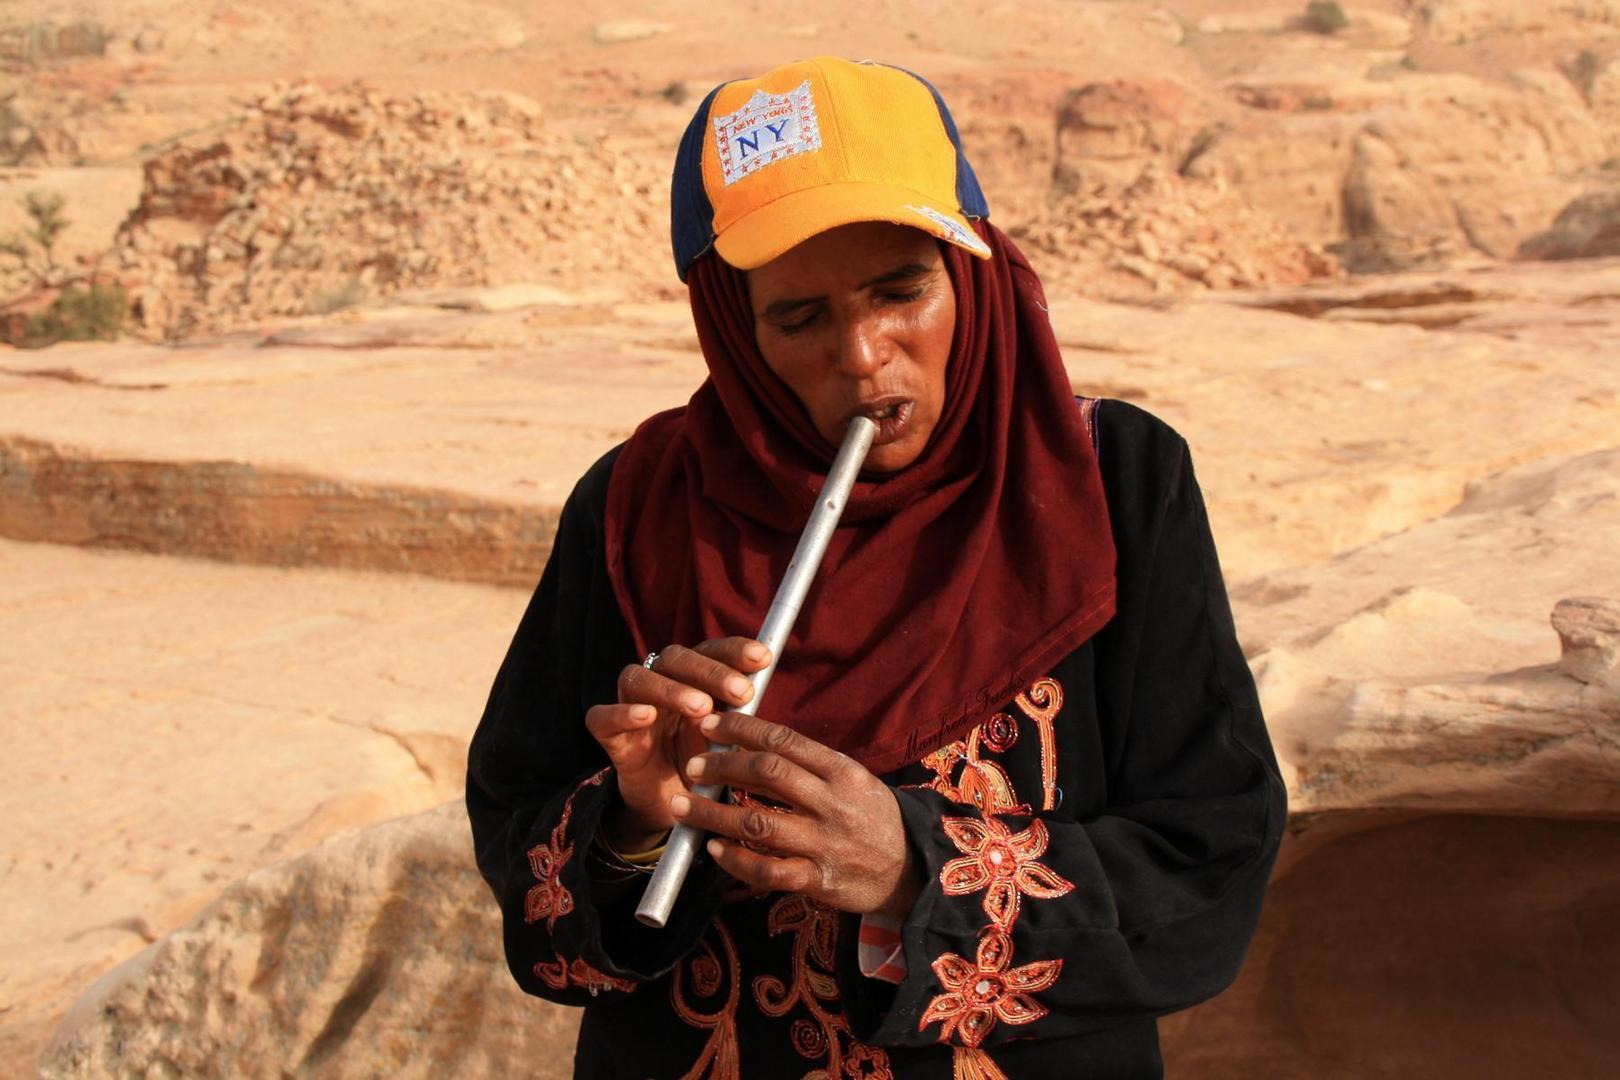 Die Flötenspielerin